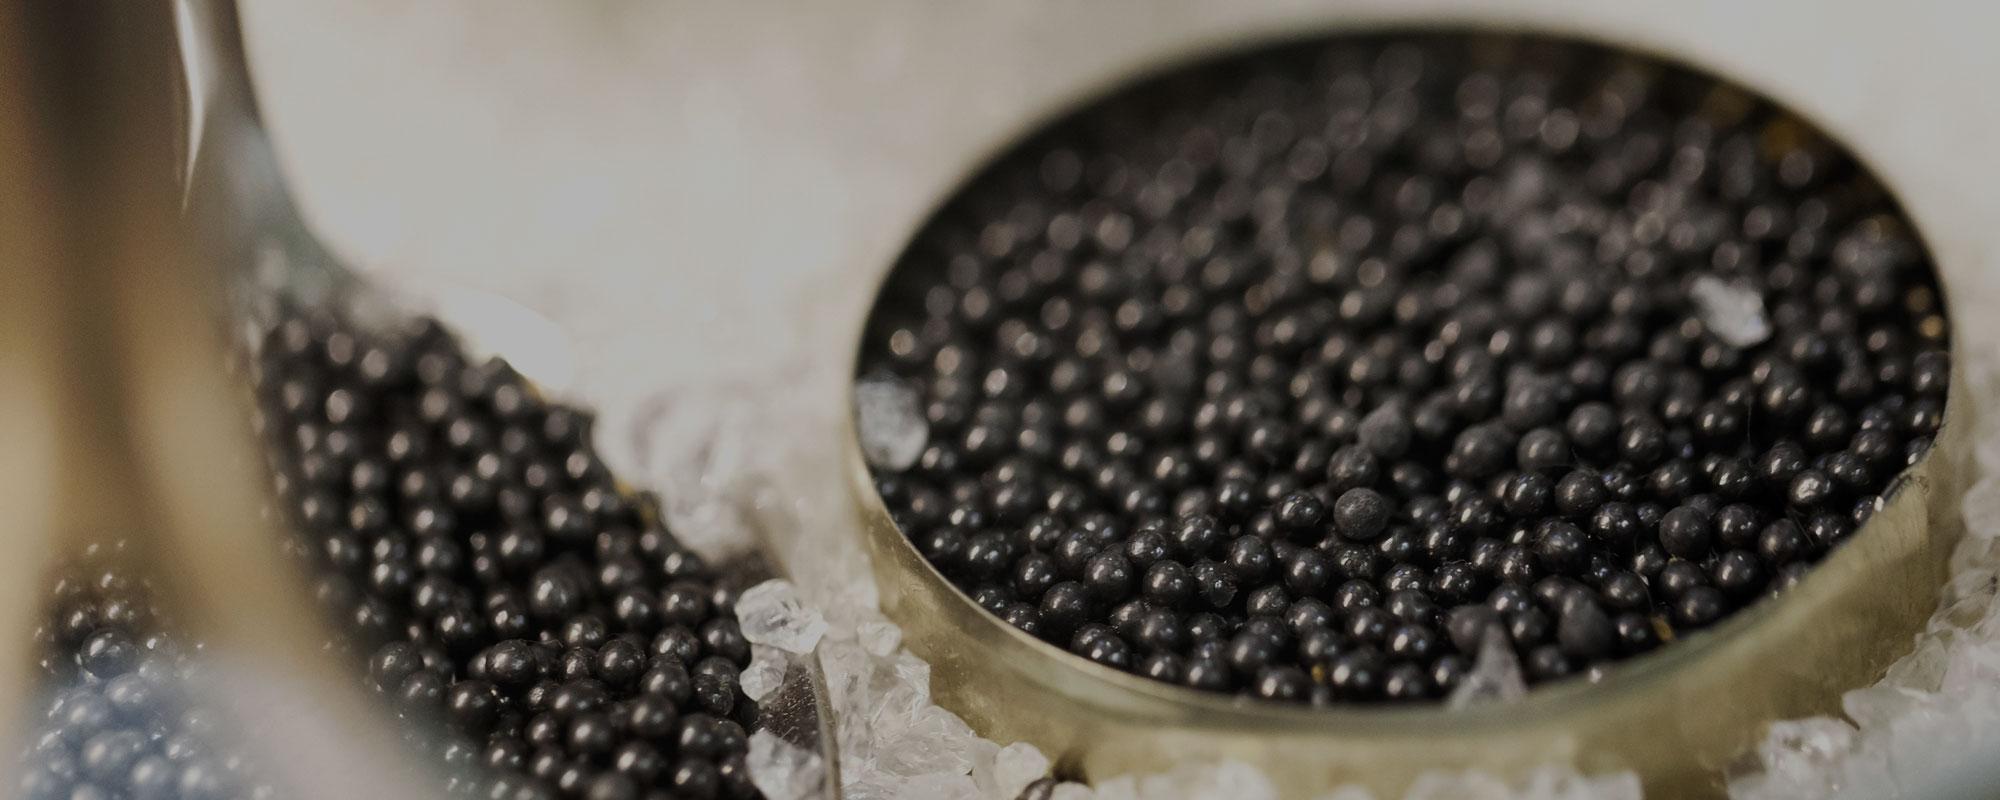 Avitaillement Caviar